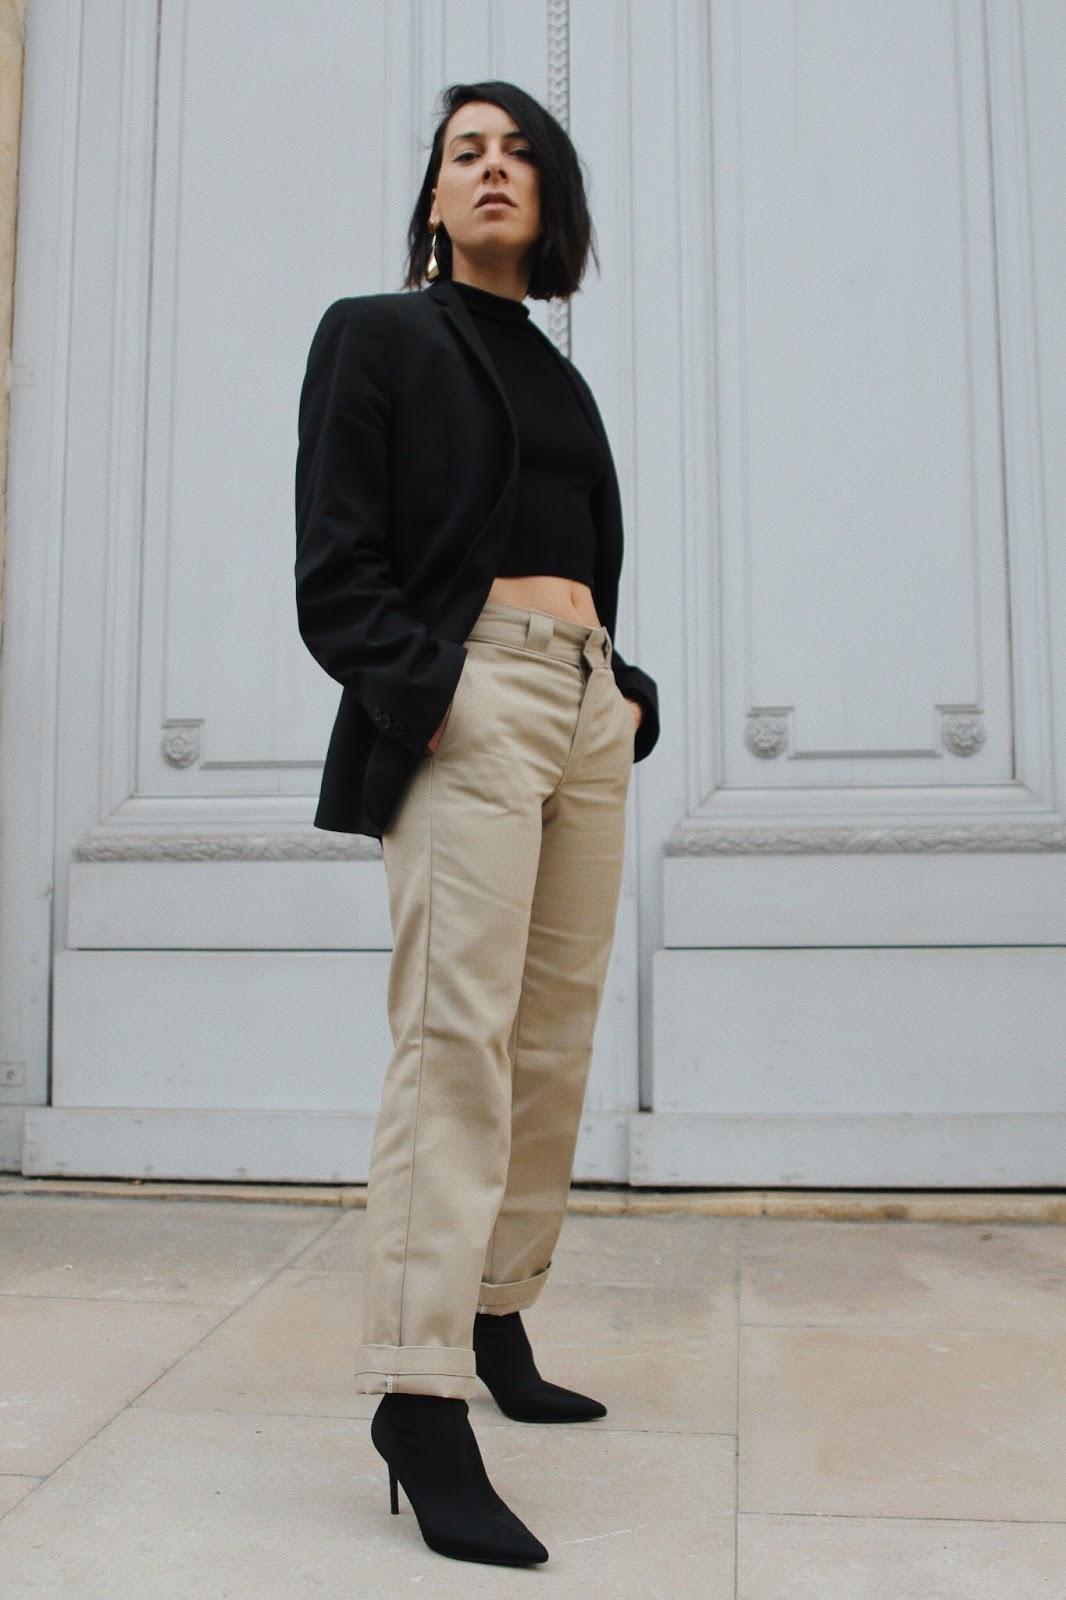 pantalon kaki tendance printemps et blazer épaulettes